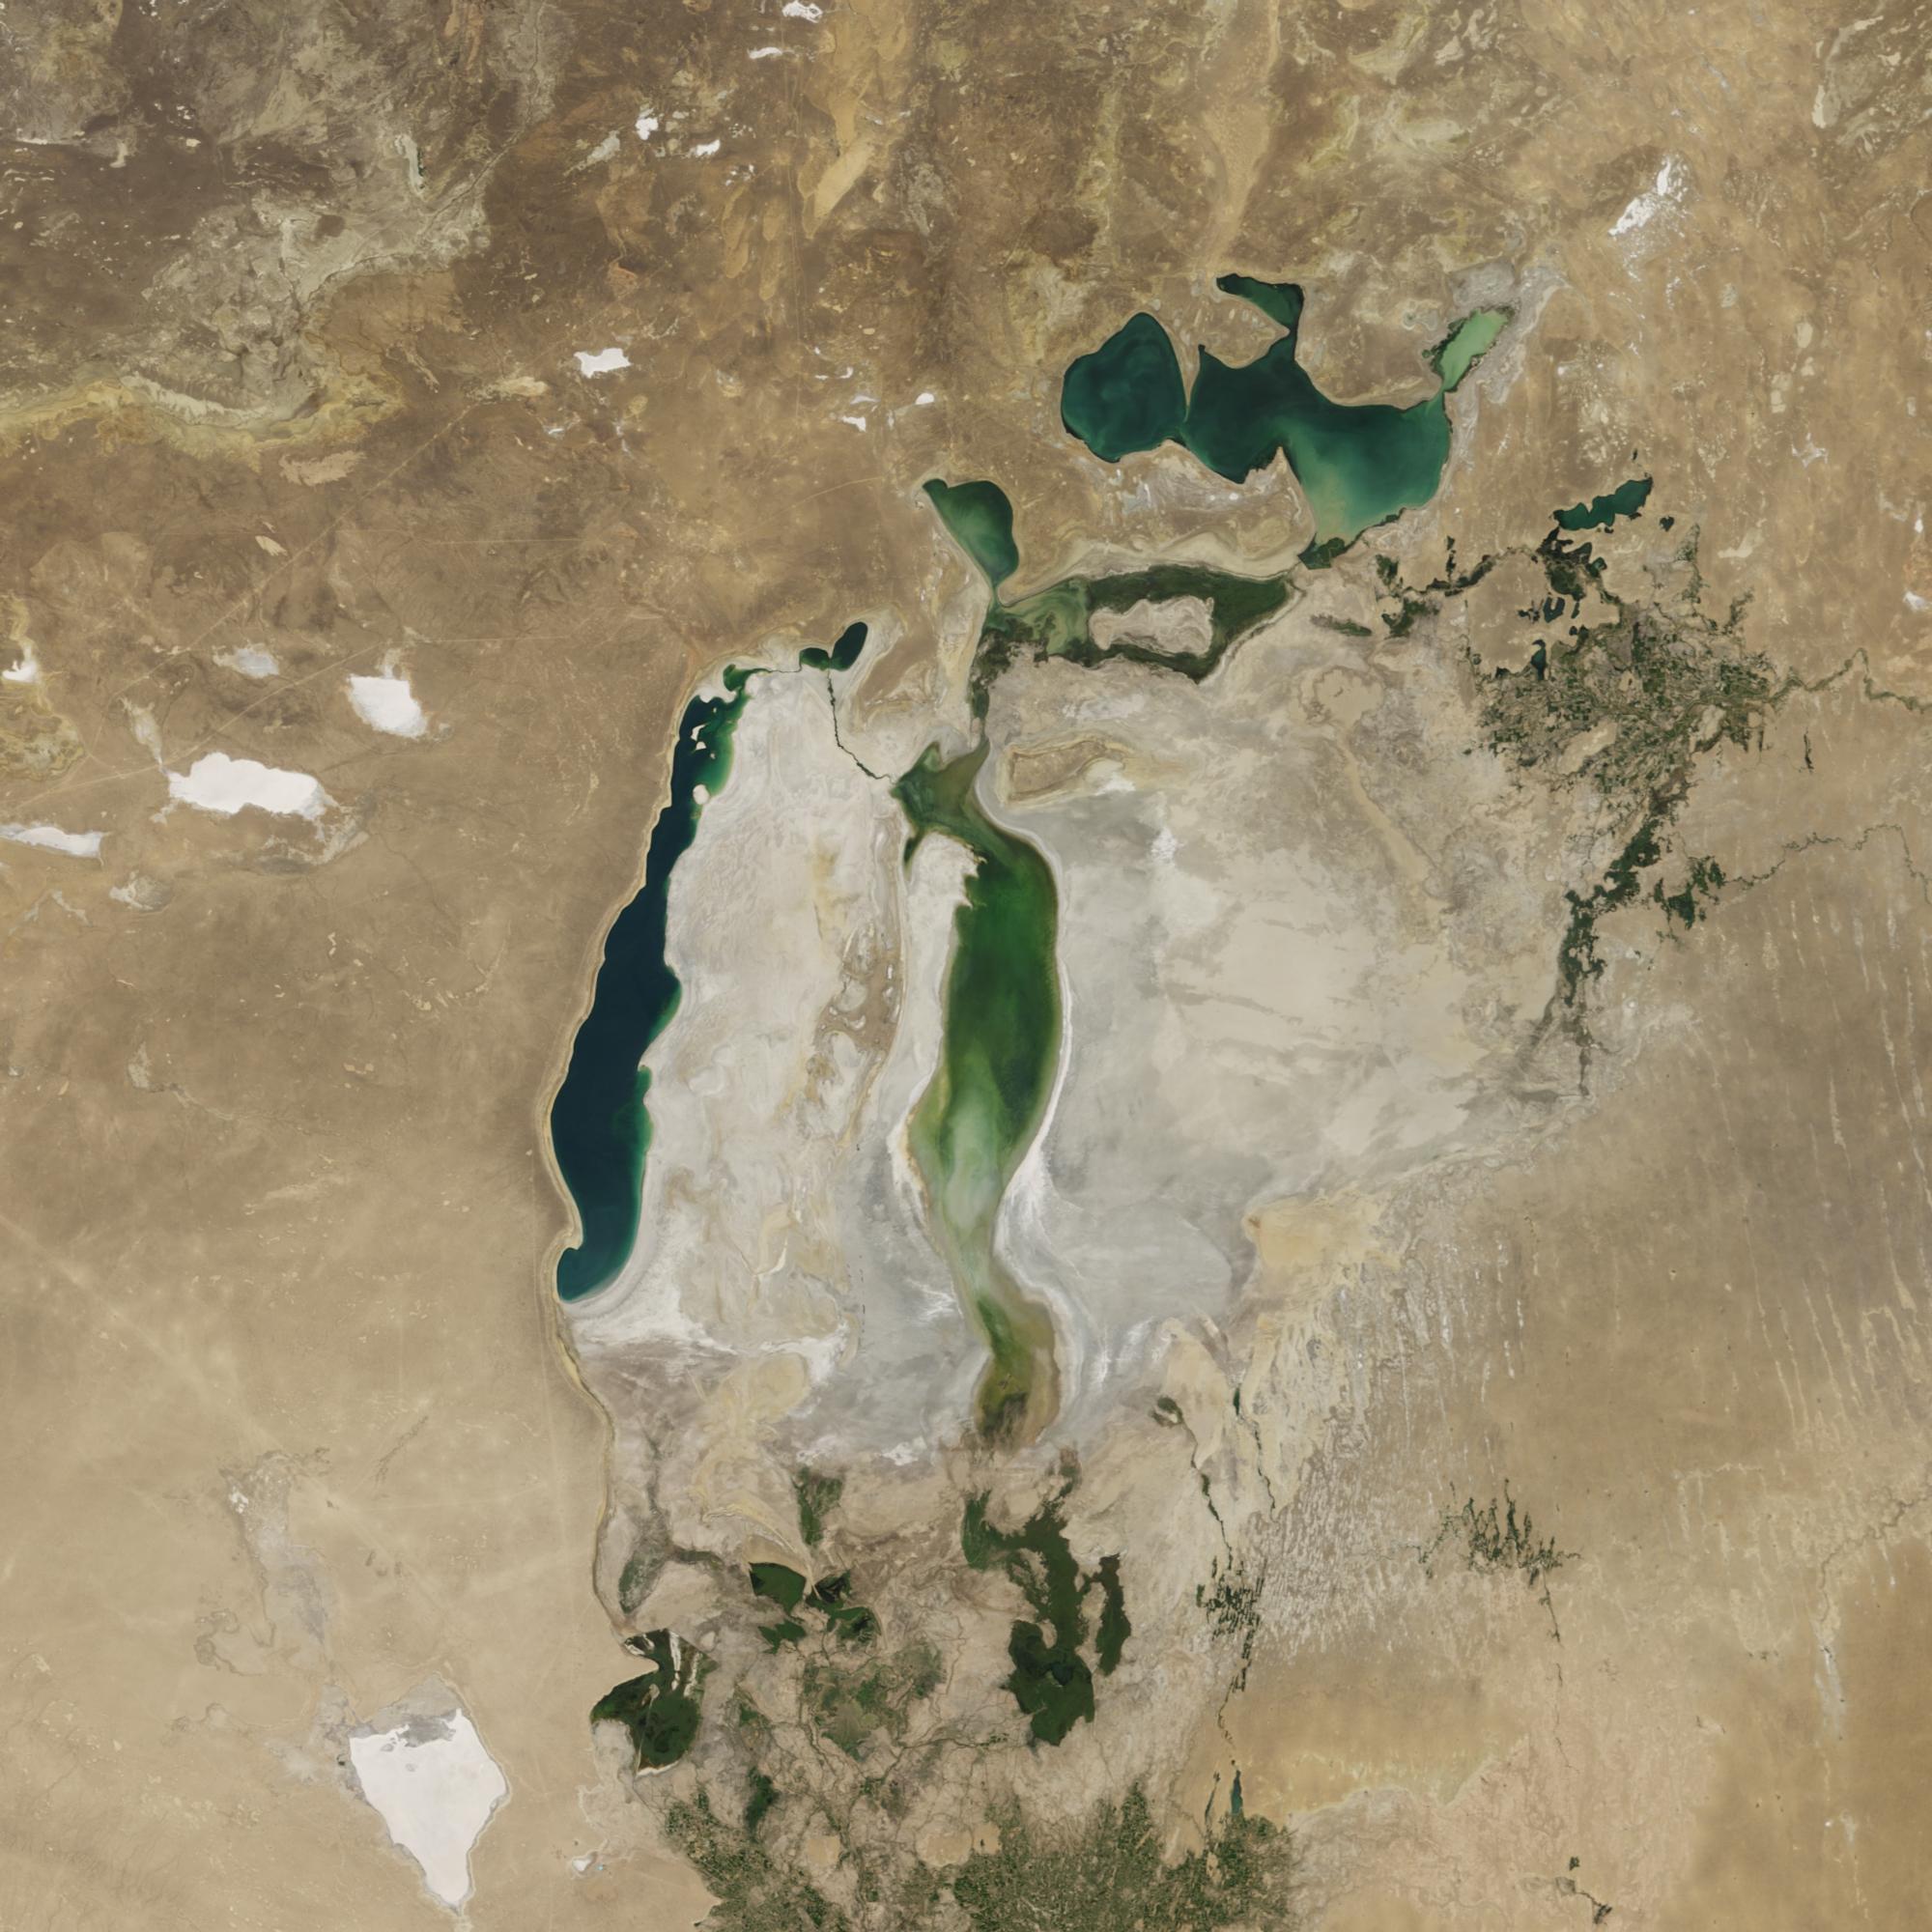 File:Aral Sea August 2017.jpg - Wikimedia Commons